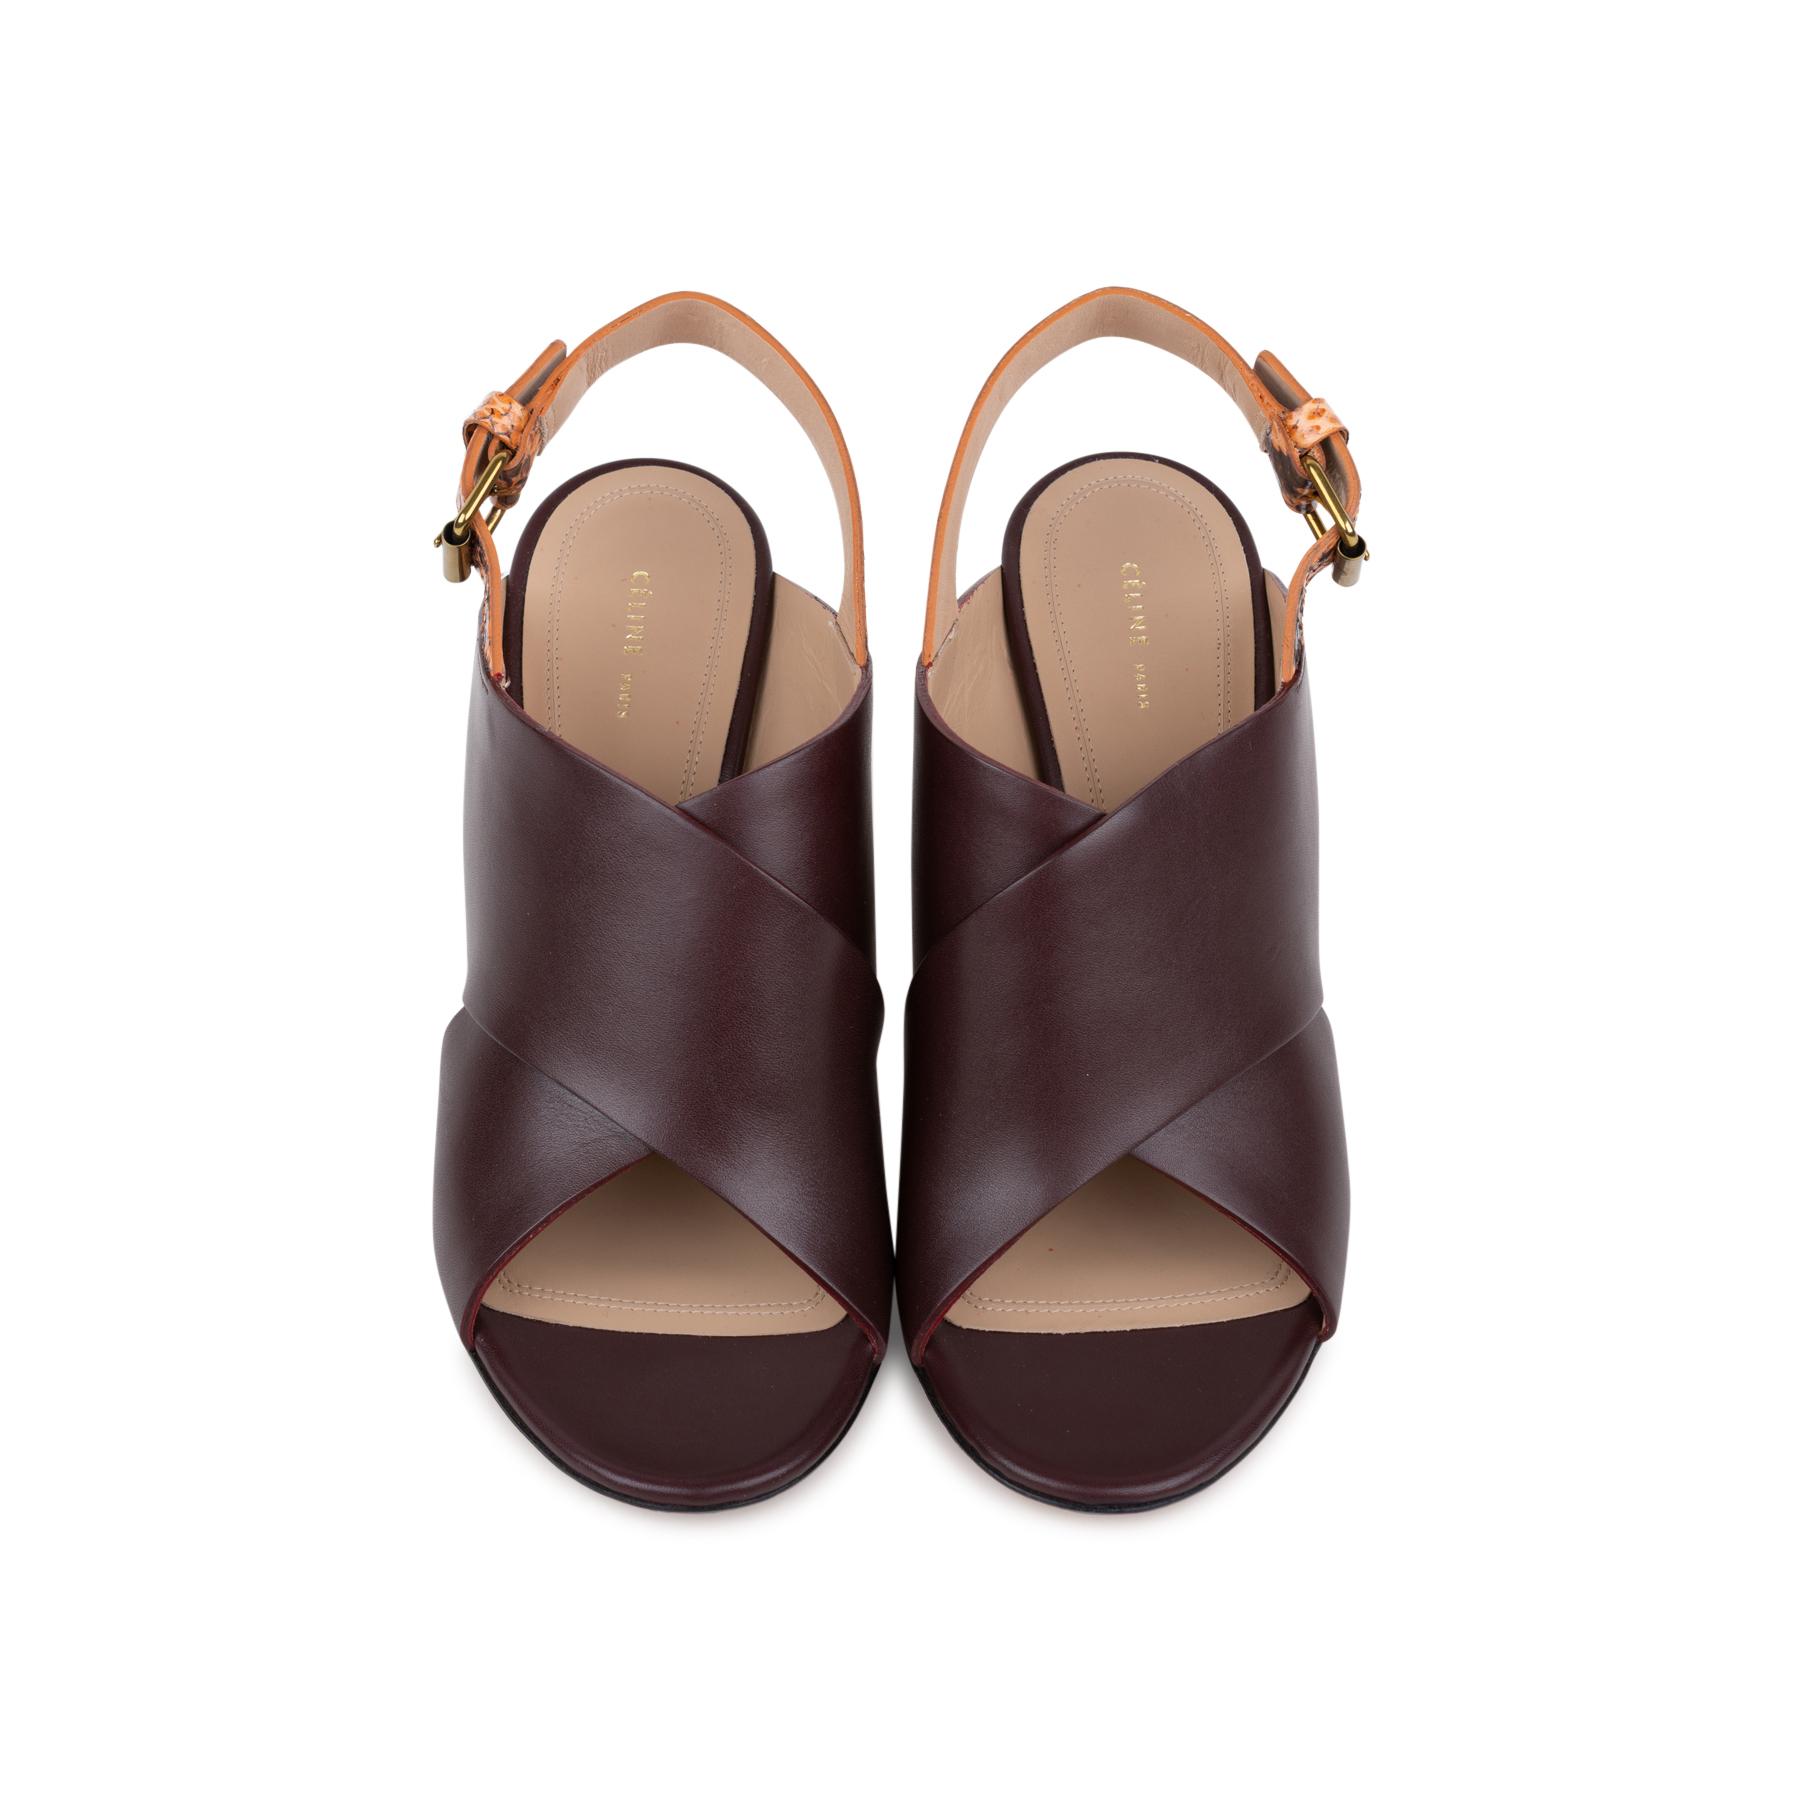 9ada9660428 Authentic Second Hand Céline Python Slingback Wedge Sandals (PSS-547-00006)